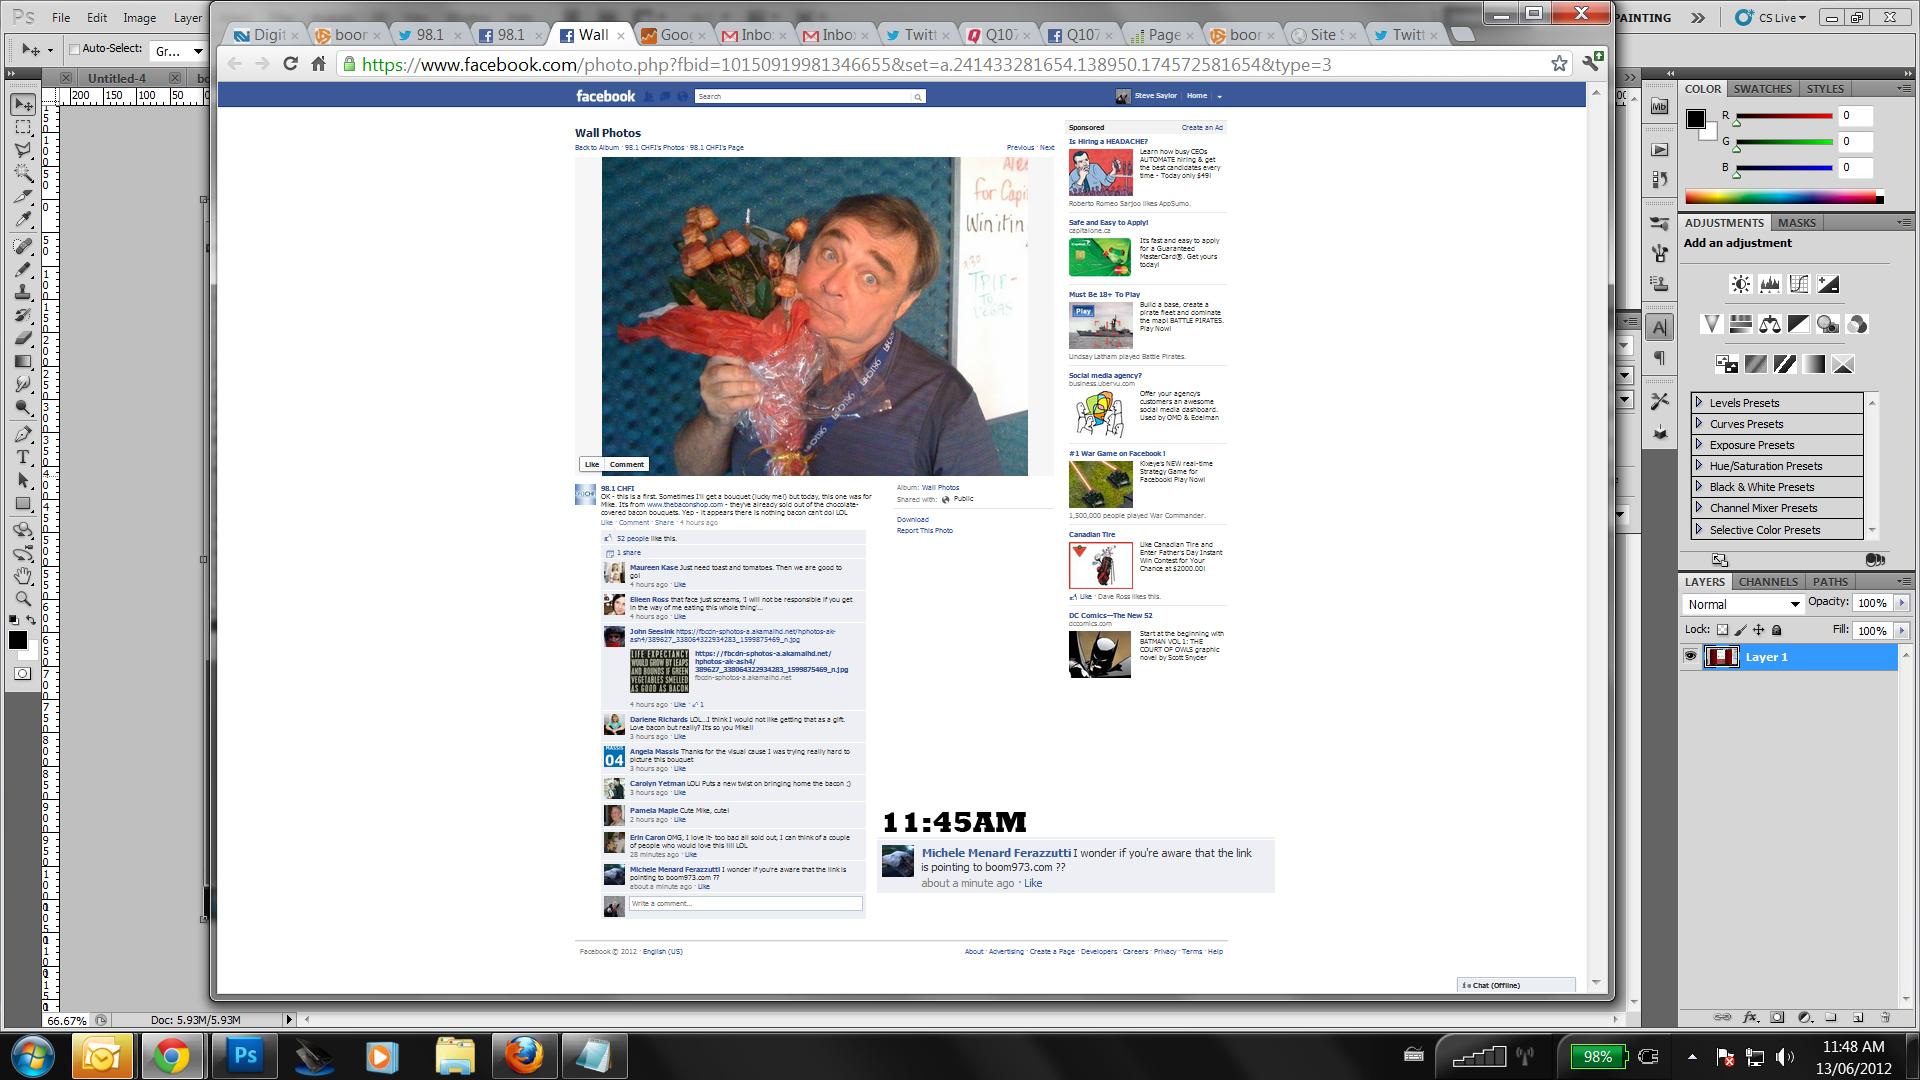 CHFI-FB-FirstboomMention.jpg